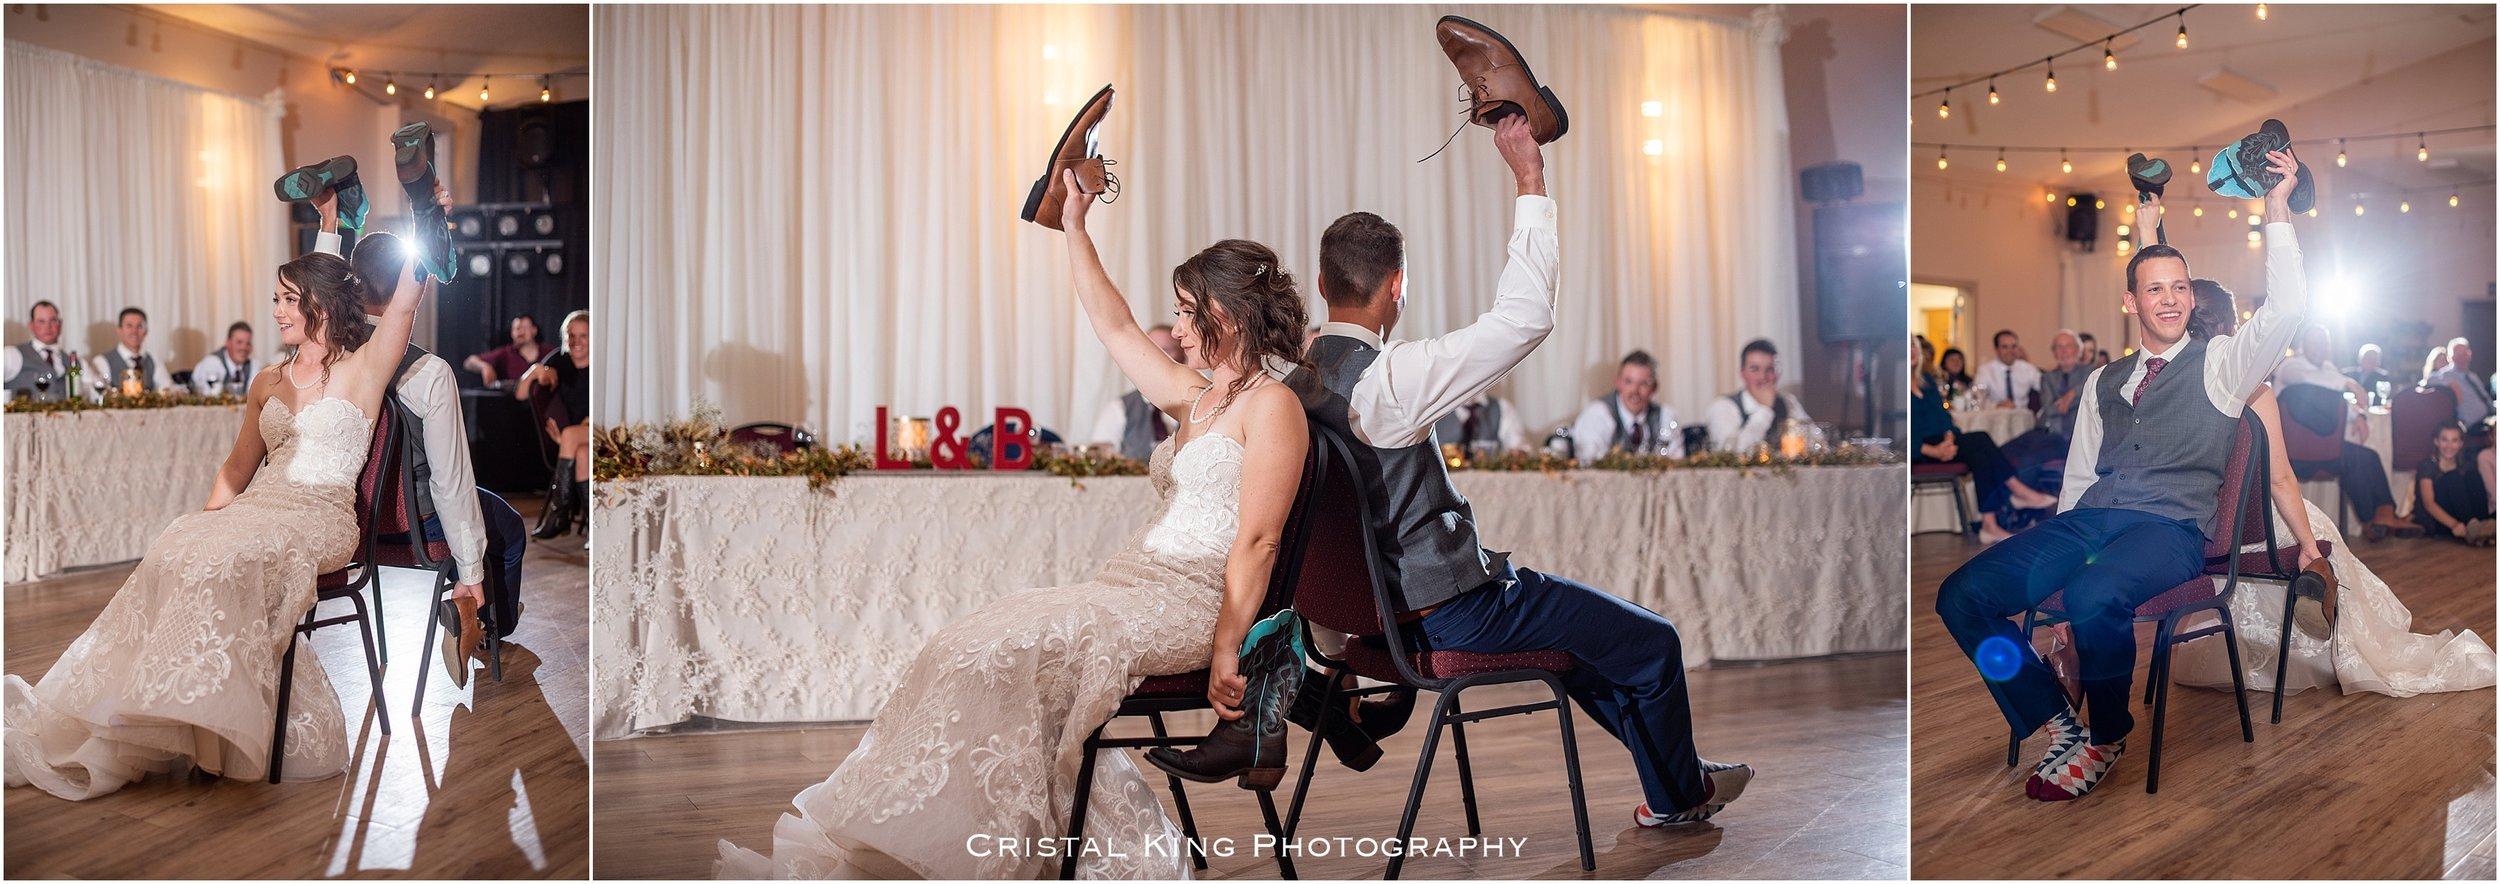 Lauren & Brennan's Wedding-163.jpg